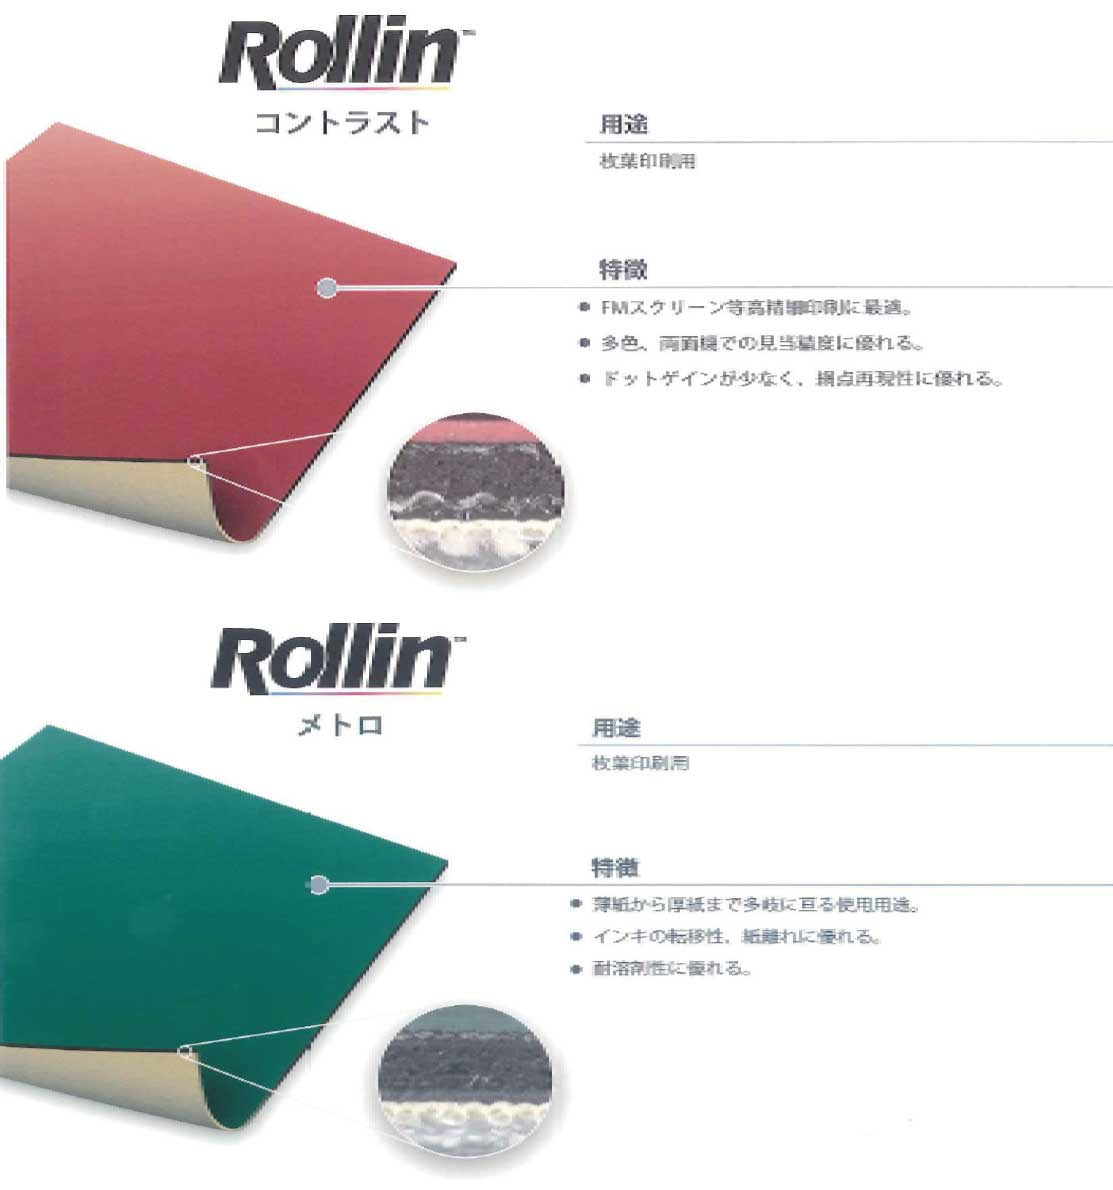 Rolln